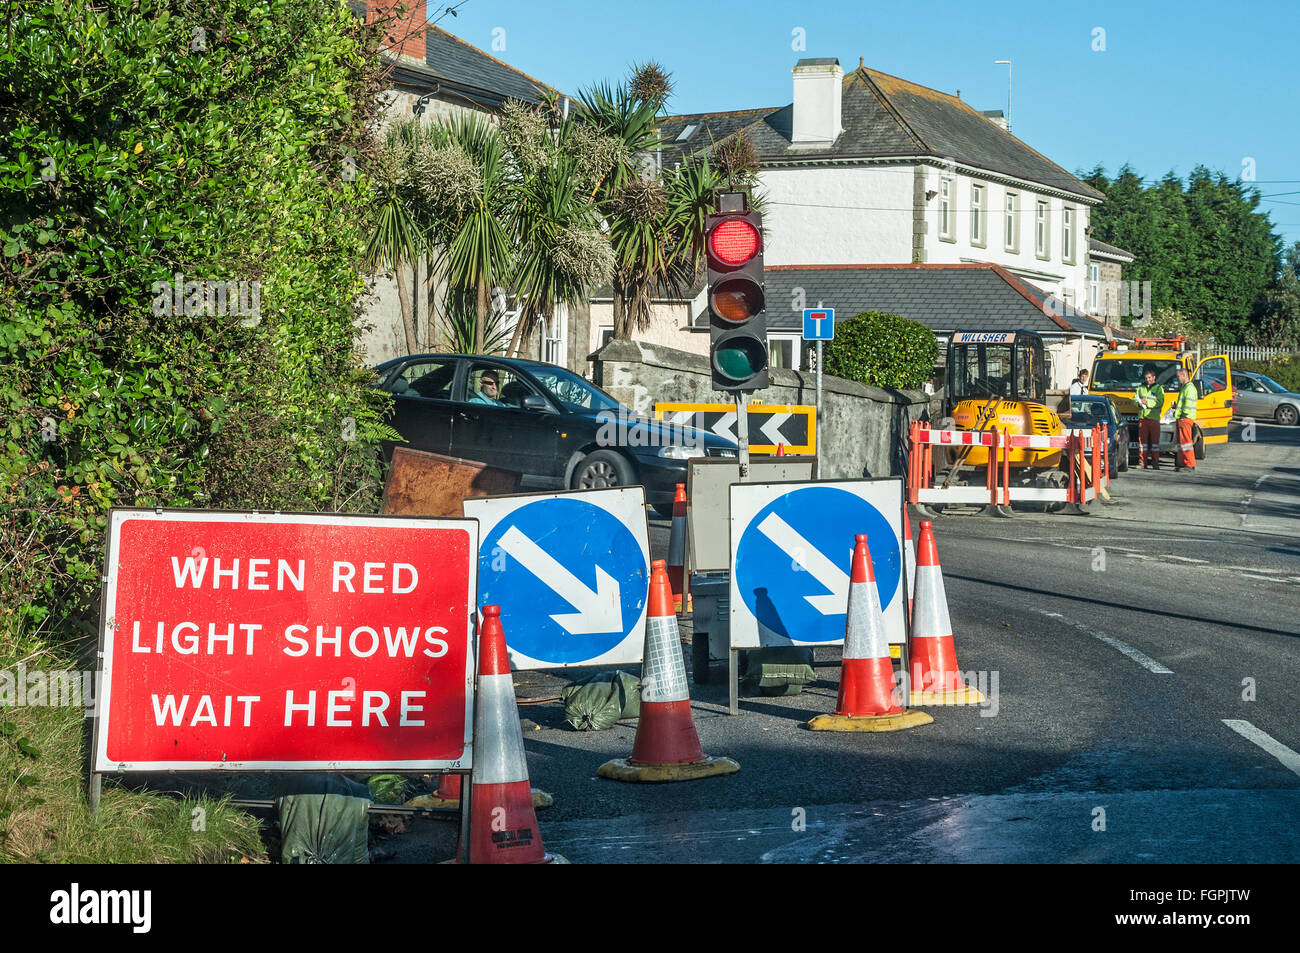 Temporary traffic lights at roadworks, uk - Stock Image